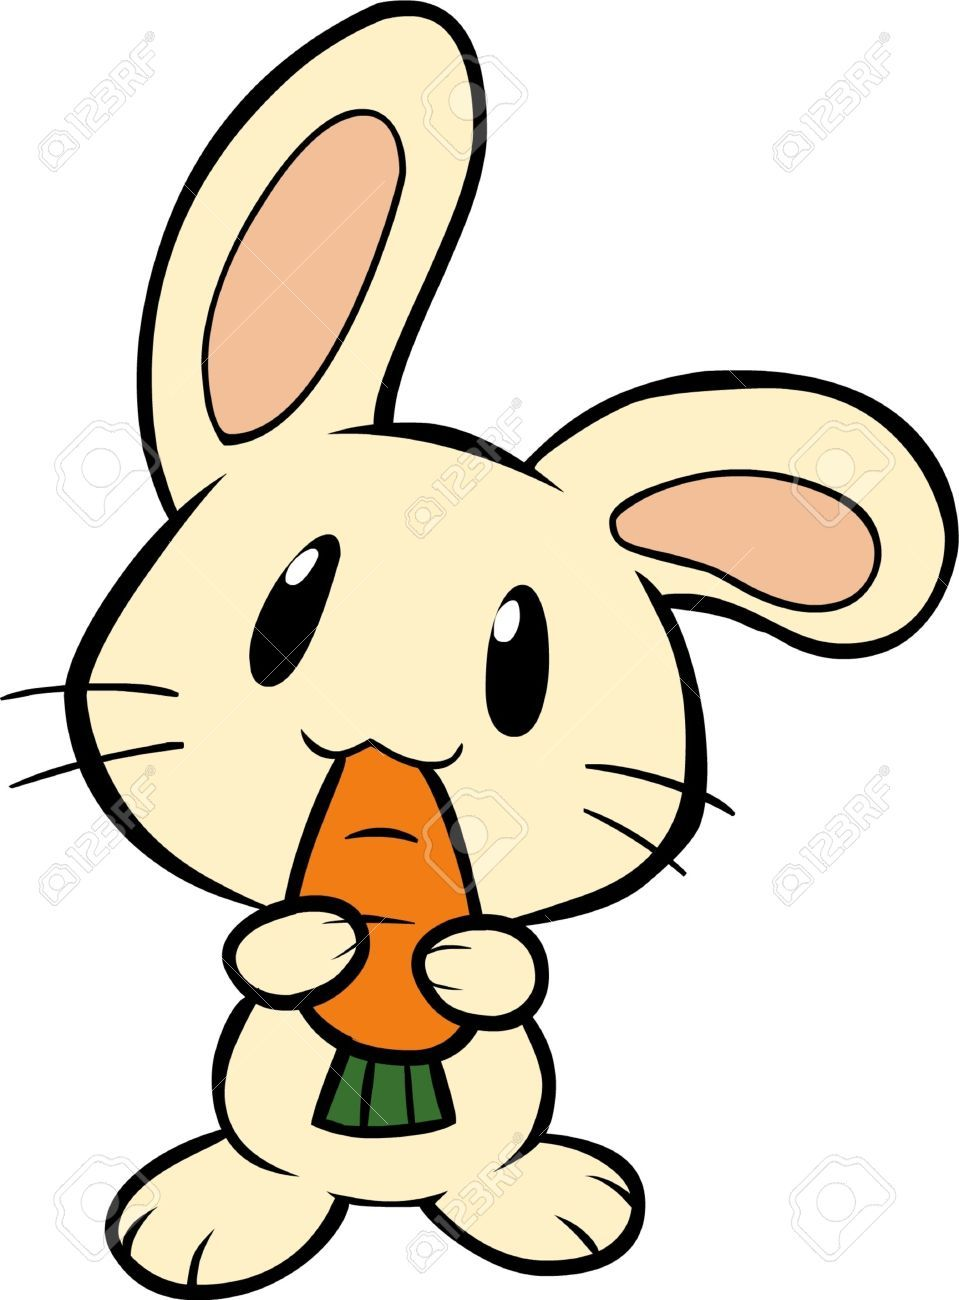 14631460 bunny eating a carrot stock vector rabbit cartoon bunny